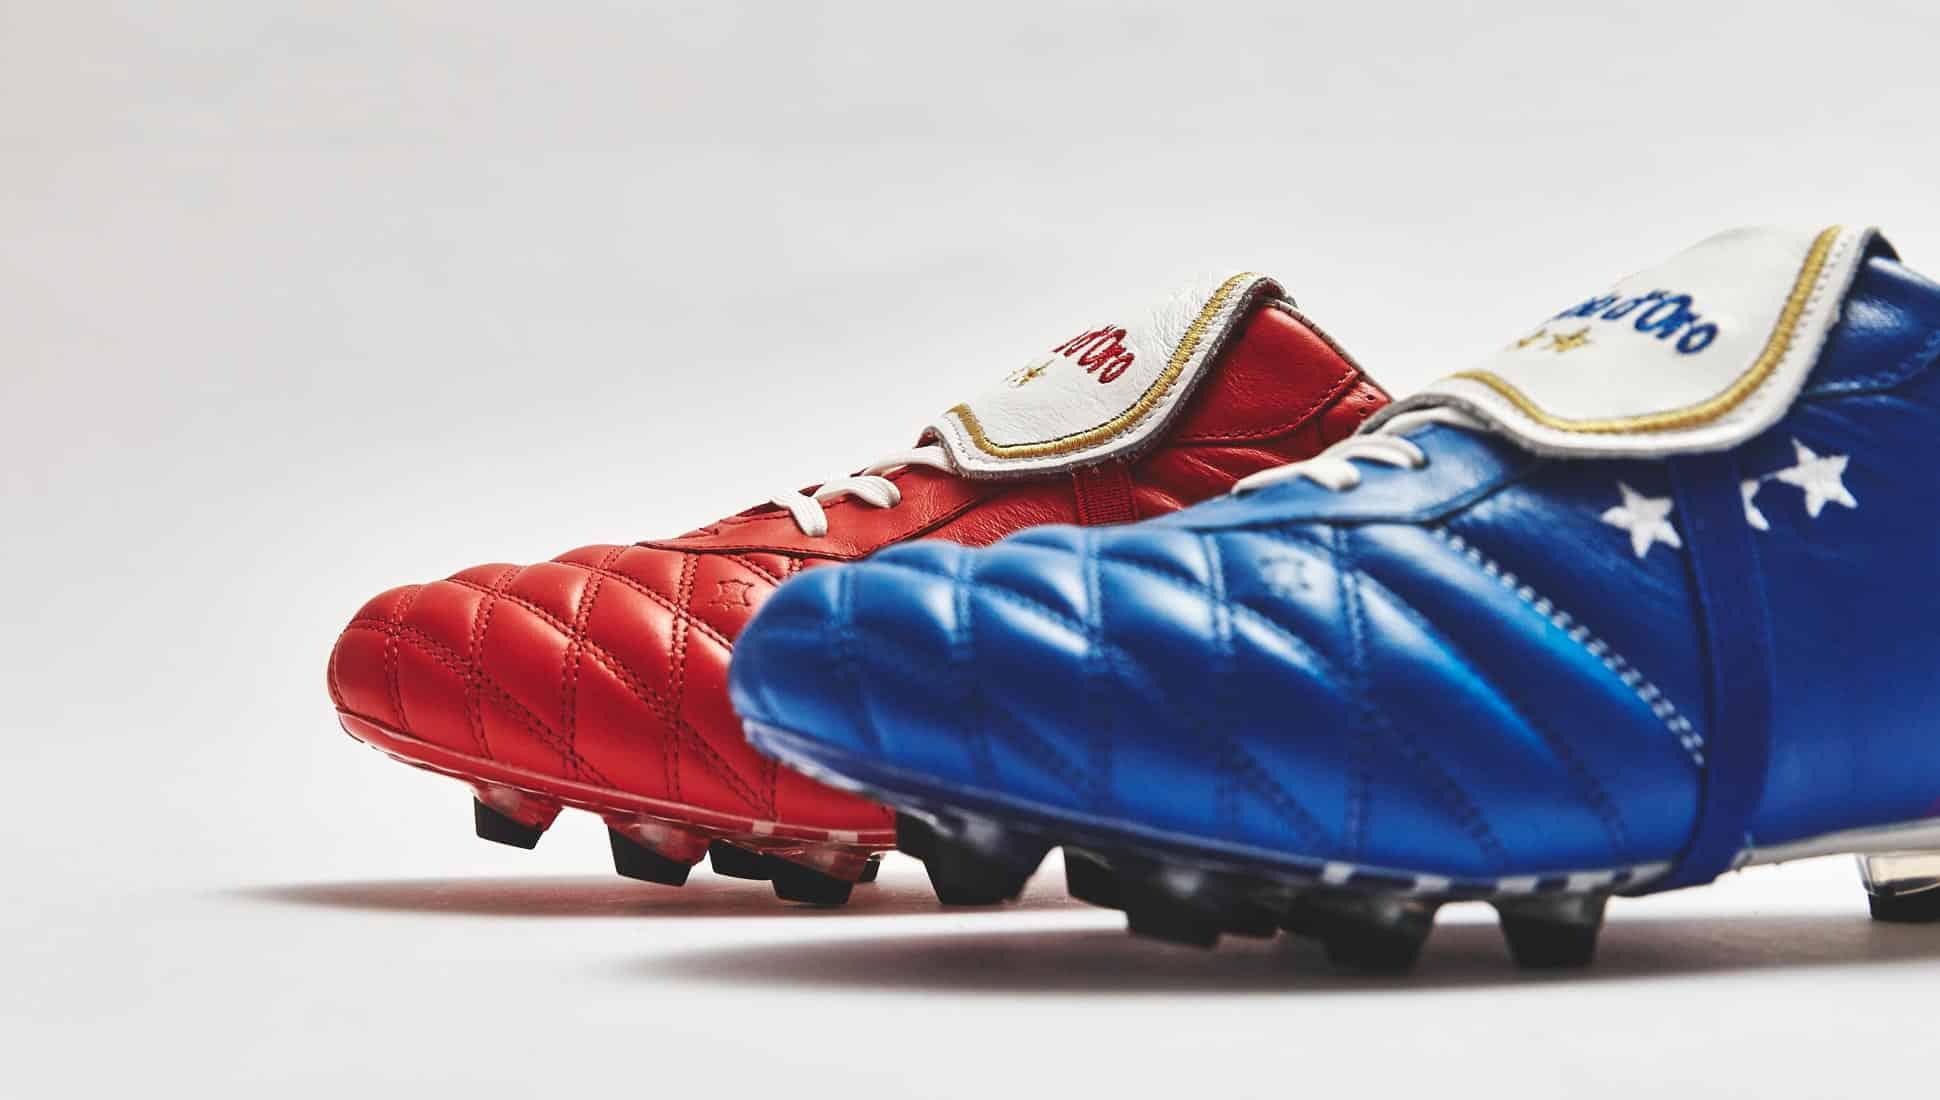 chaussures-football-pantofola-doro-emidio-italia-red-blue-1